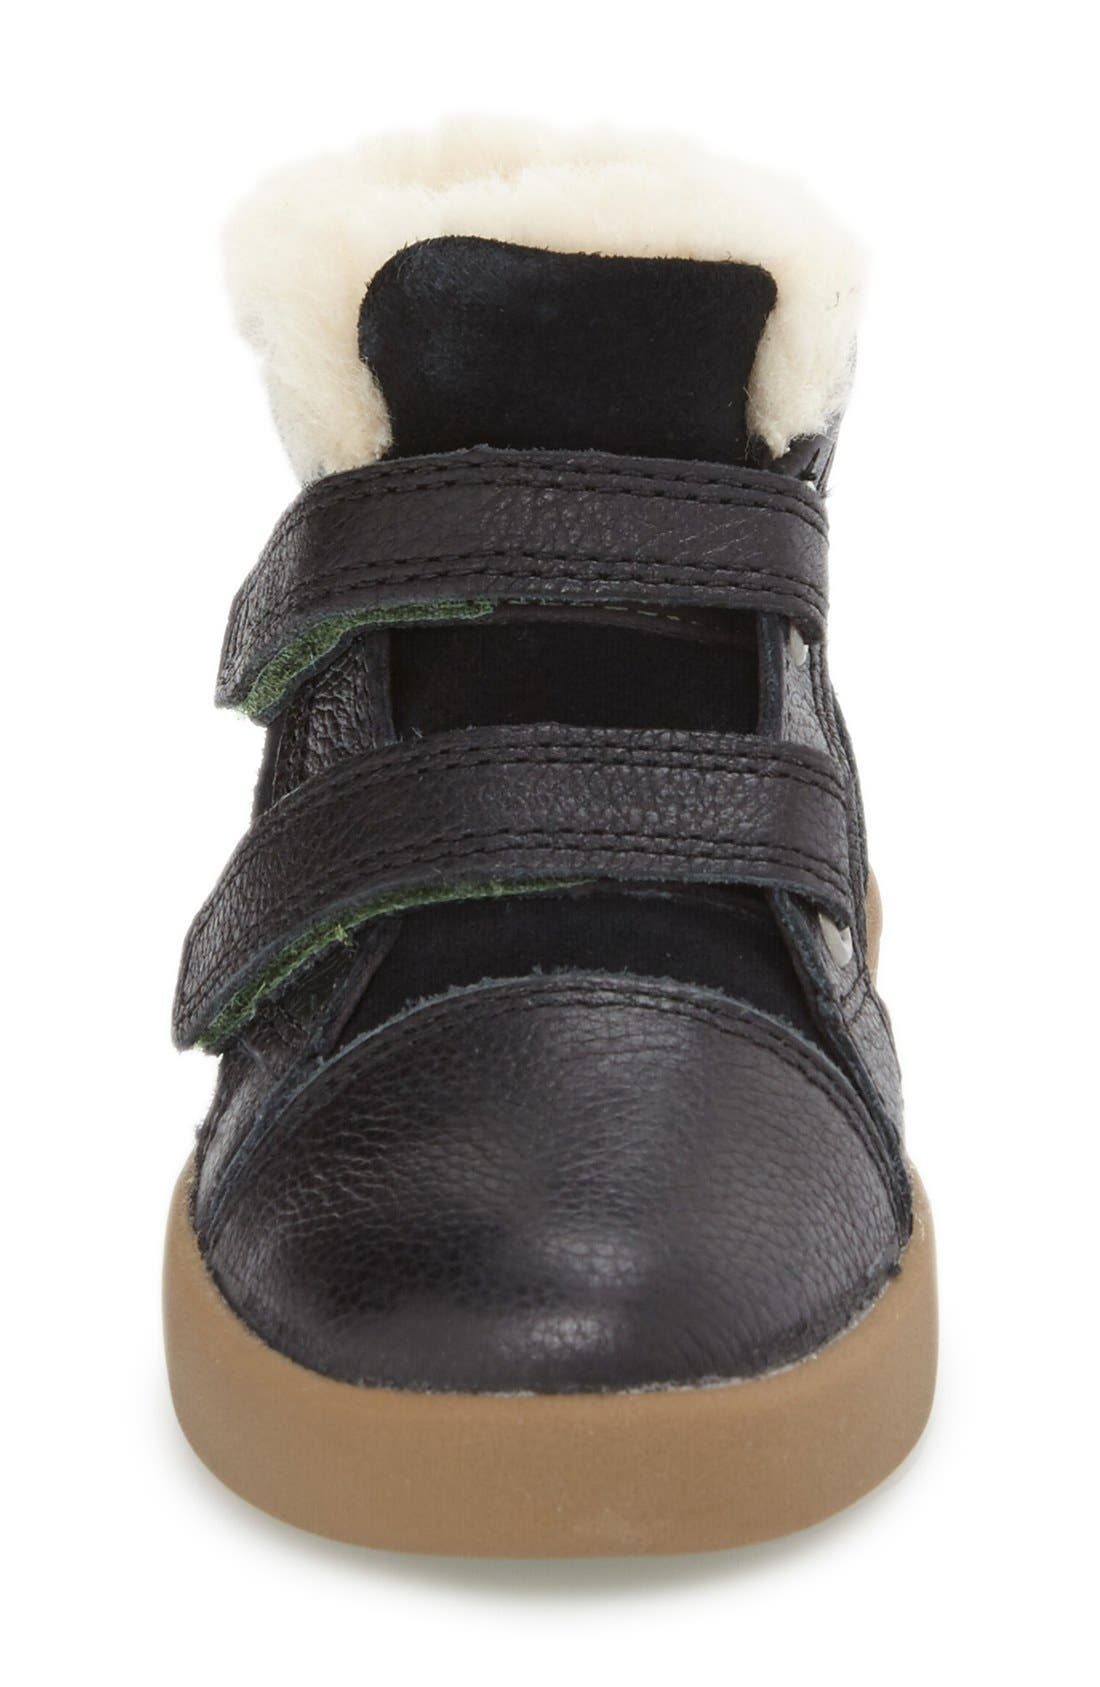 Rennon High Top Sneaker,                             Alternate thumbnail 3, color,                             001